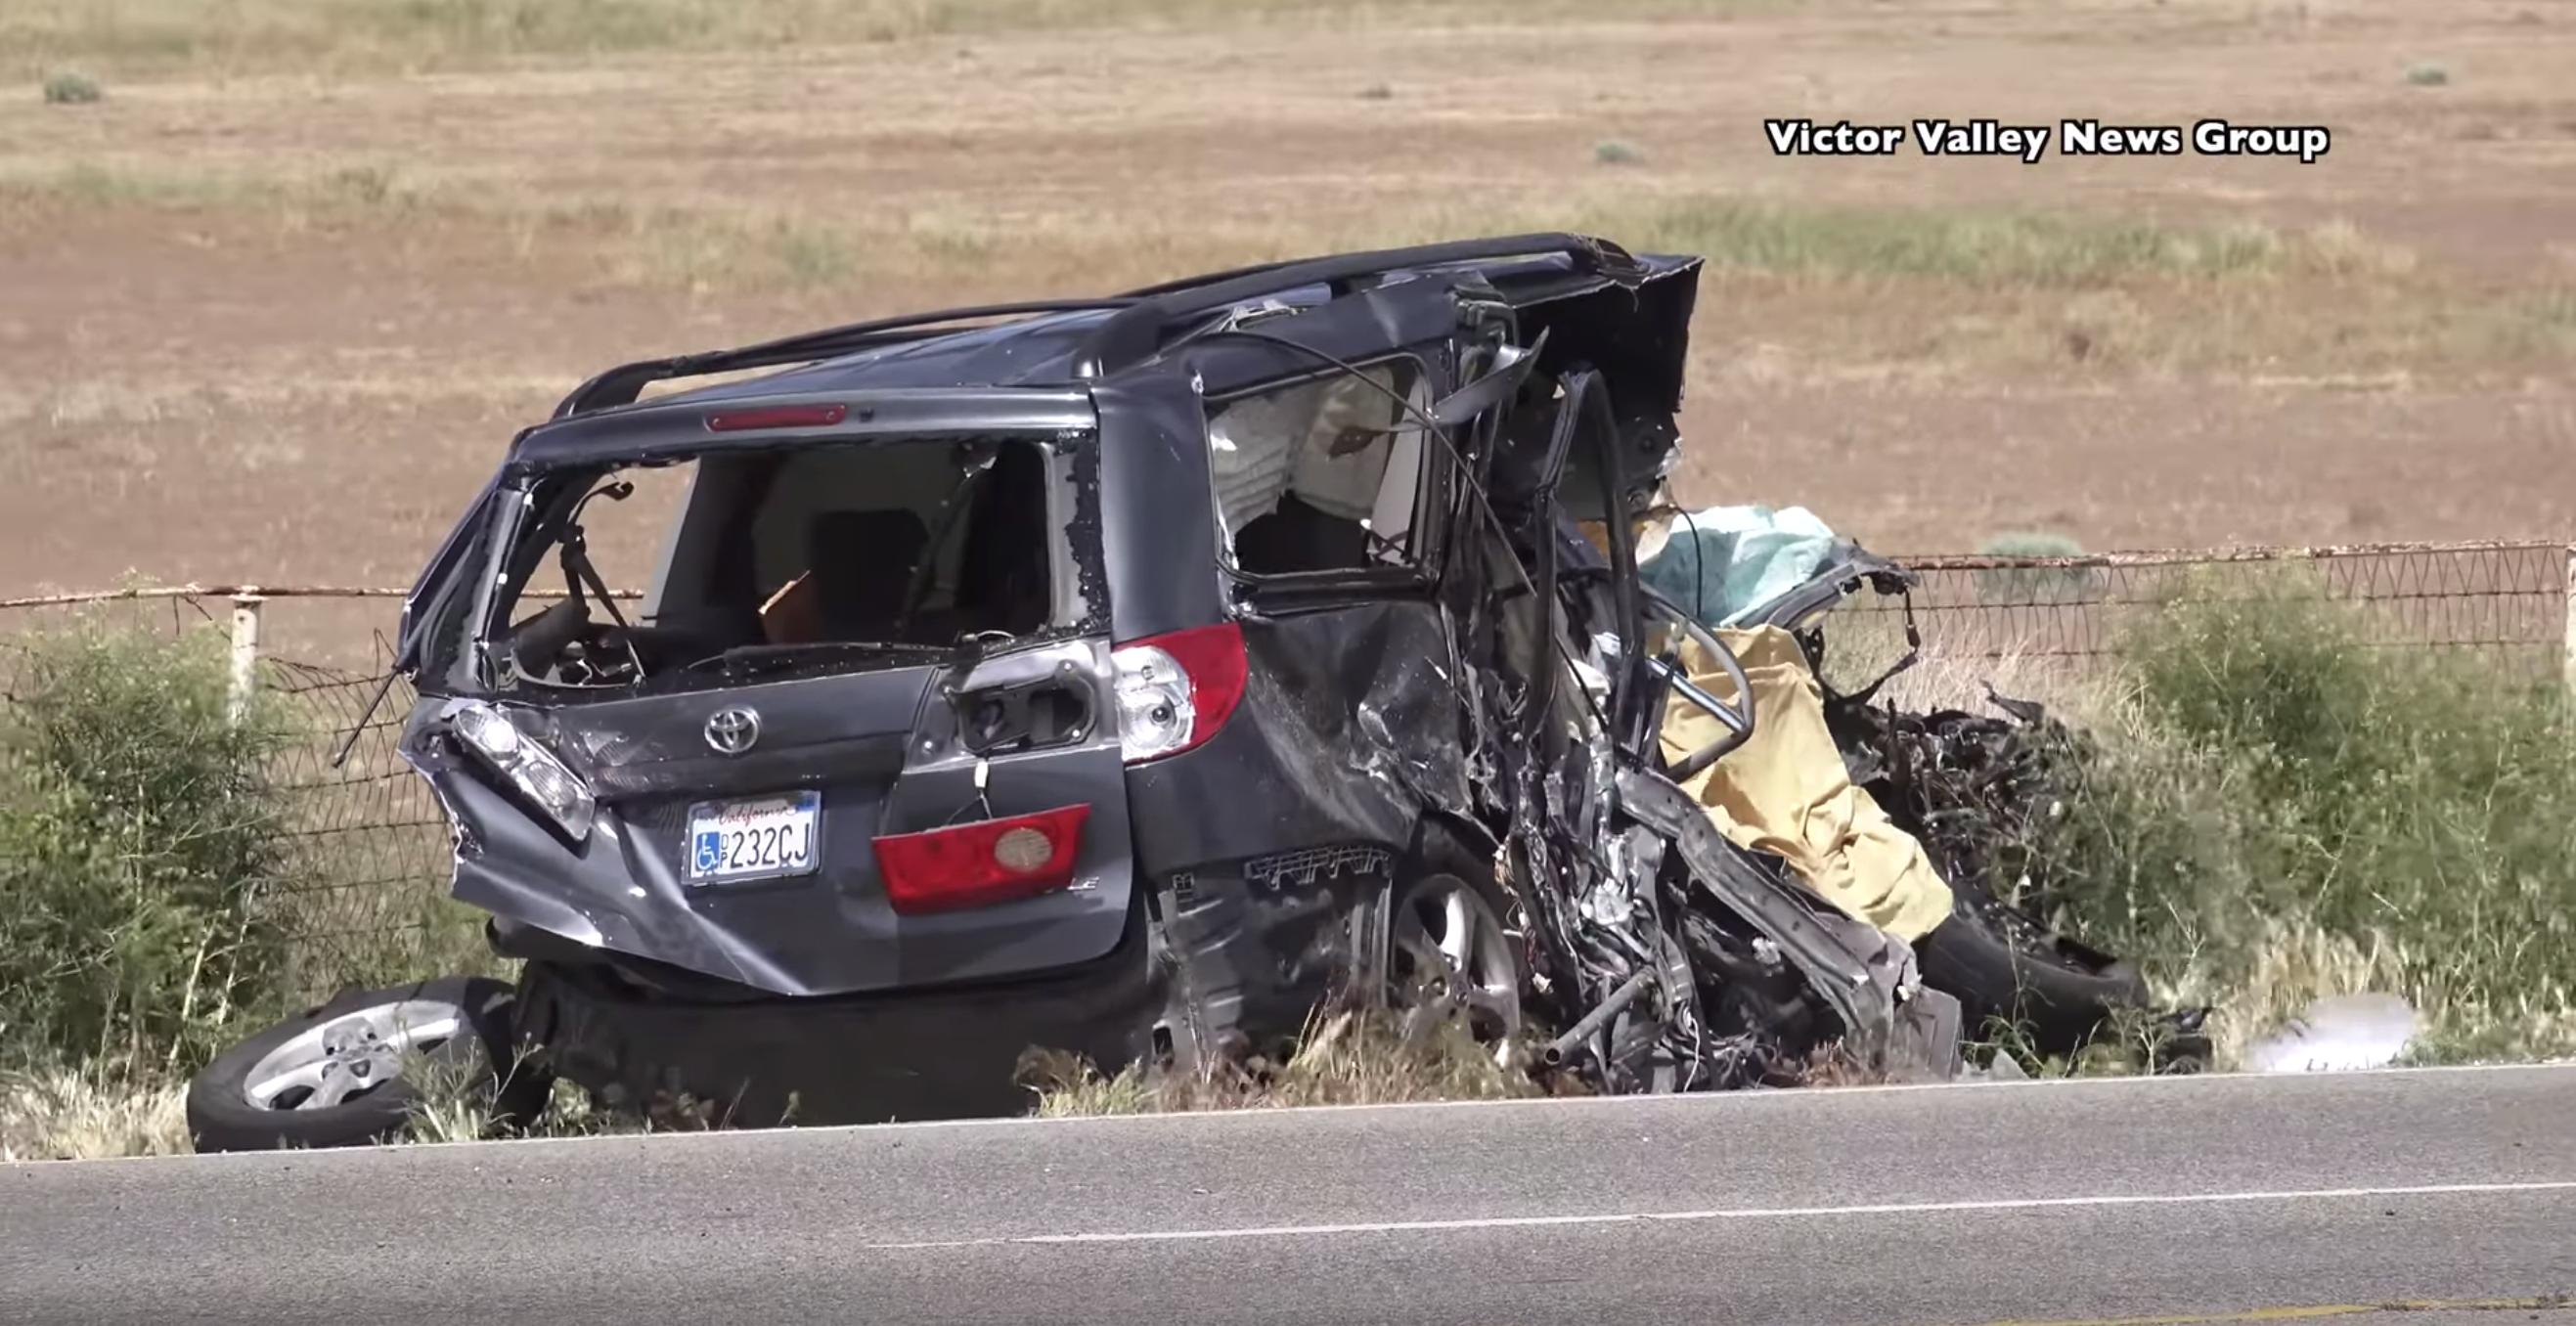 Amanda Hinman died Sunday in a crash on Bear Valley Road. (Hugo C. Valdez)